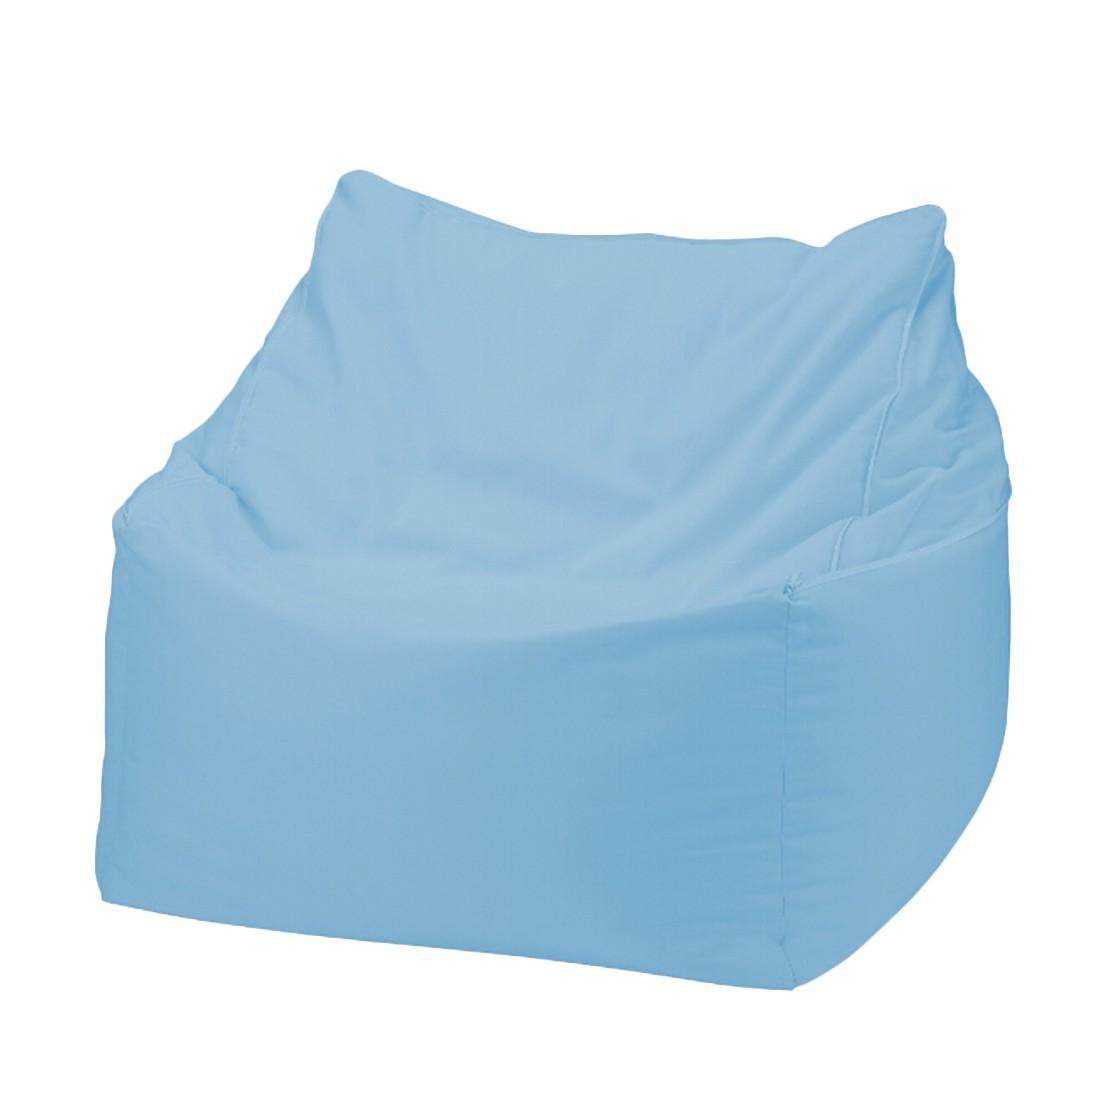 Sitzwürfel 2 in 1Baumwolle impräg. Aqua – 70 x 70 cm, KC-Handel online bestellen